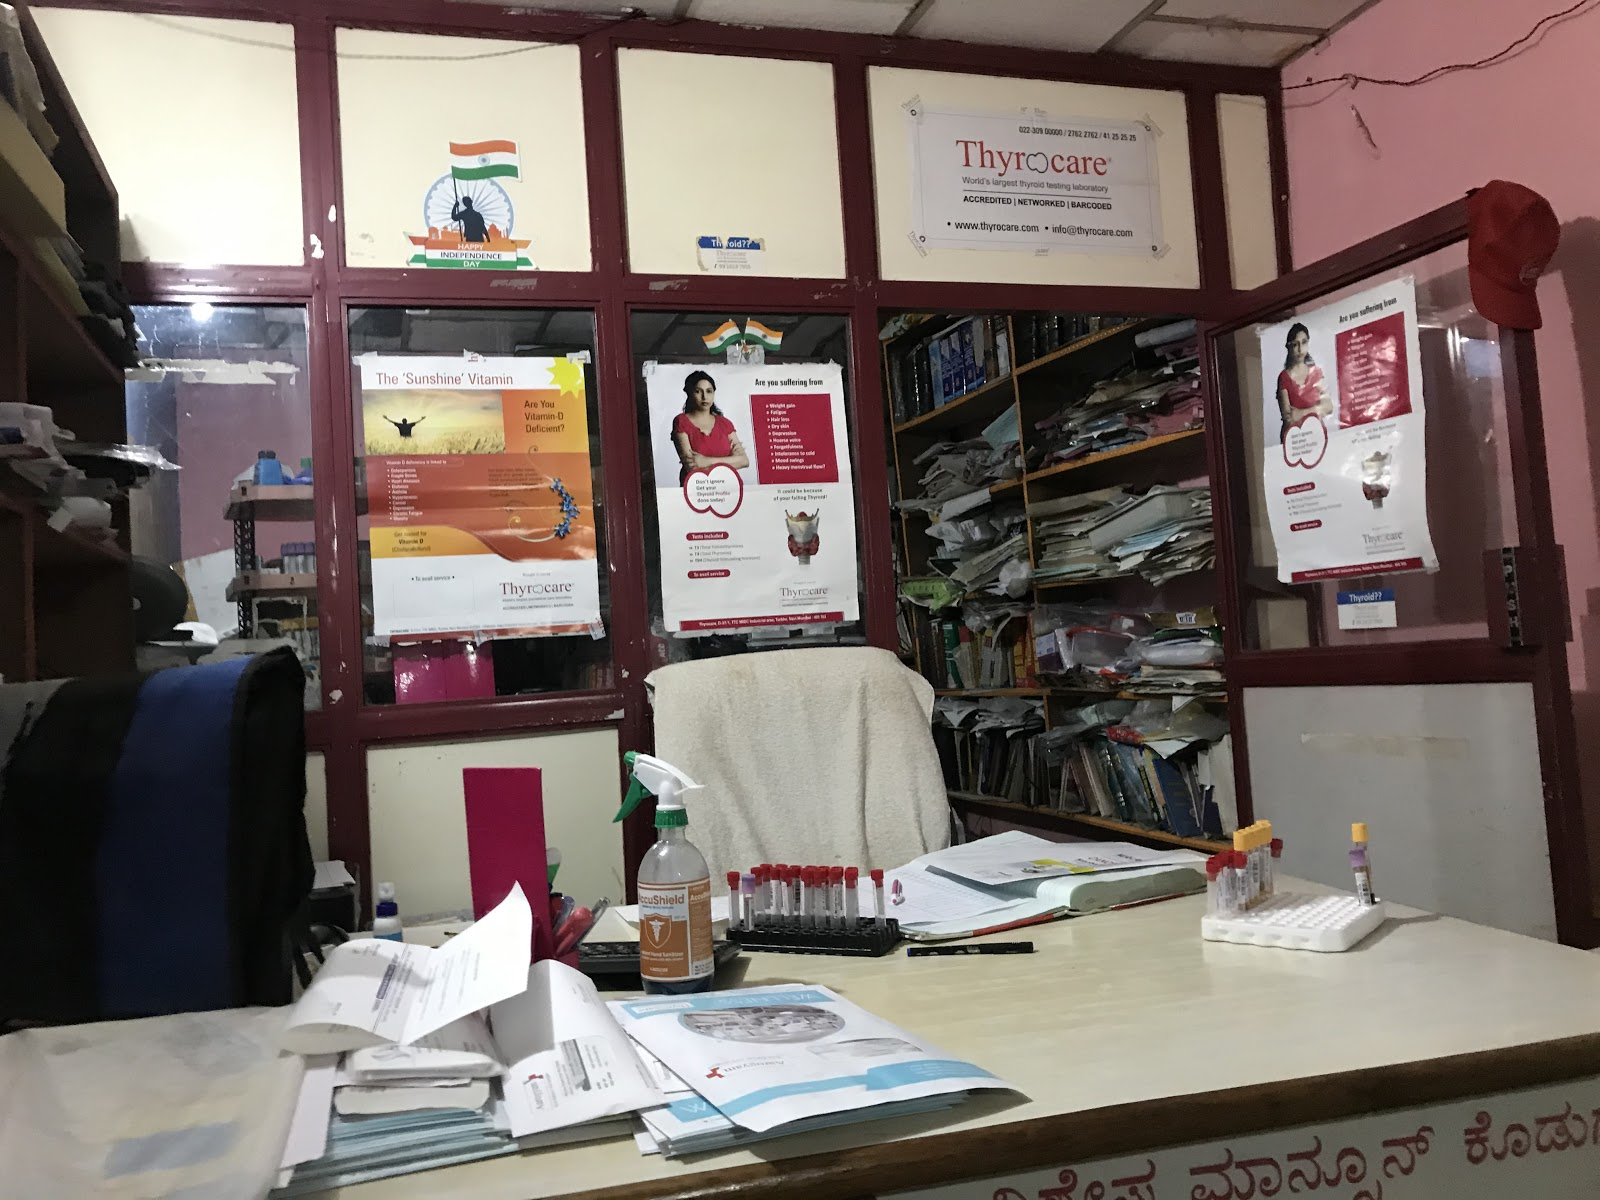 blood bank Thyrocare near Dharwad Karnataka